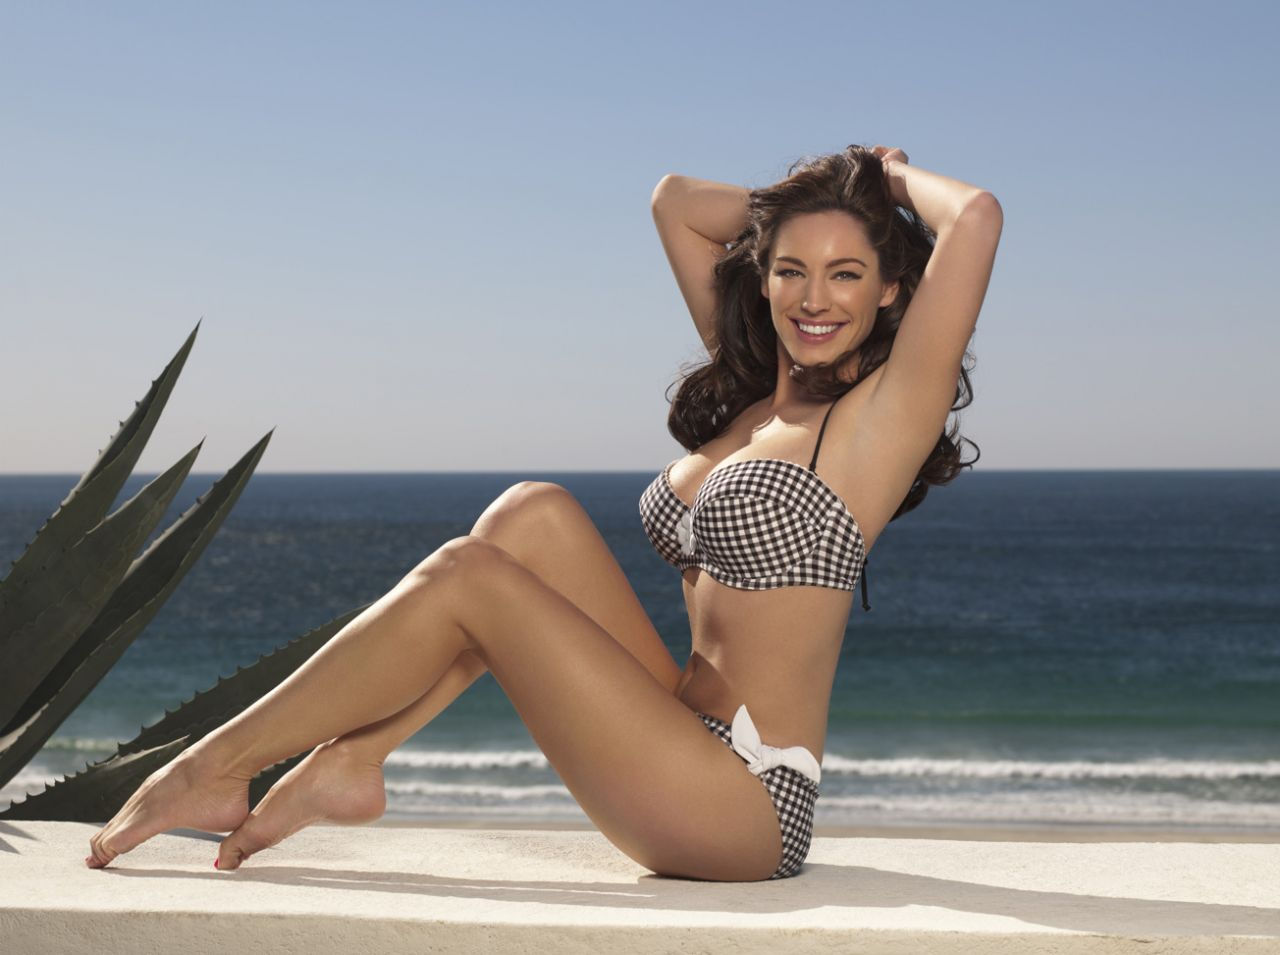 Kelly Brook Bikini Photoshoot - New Look Swimwear, April 2014